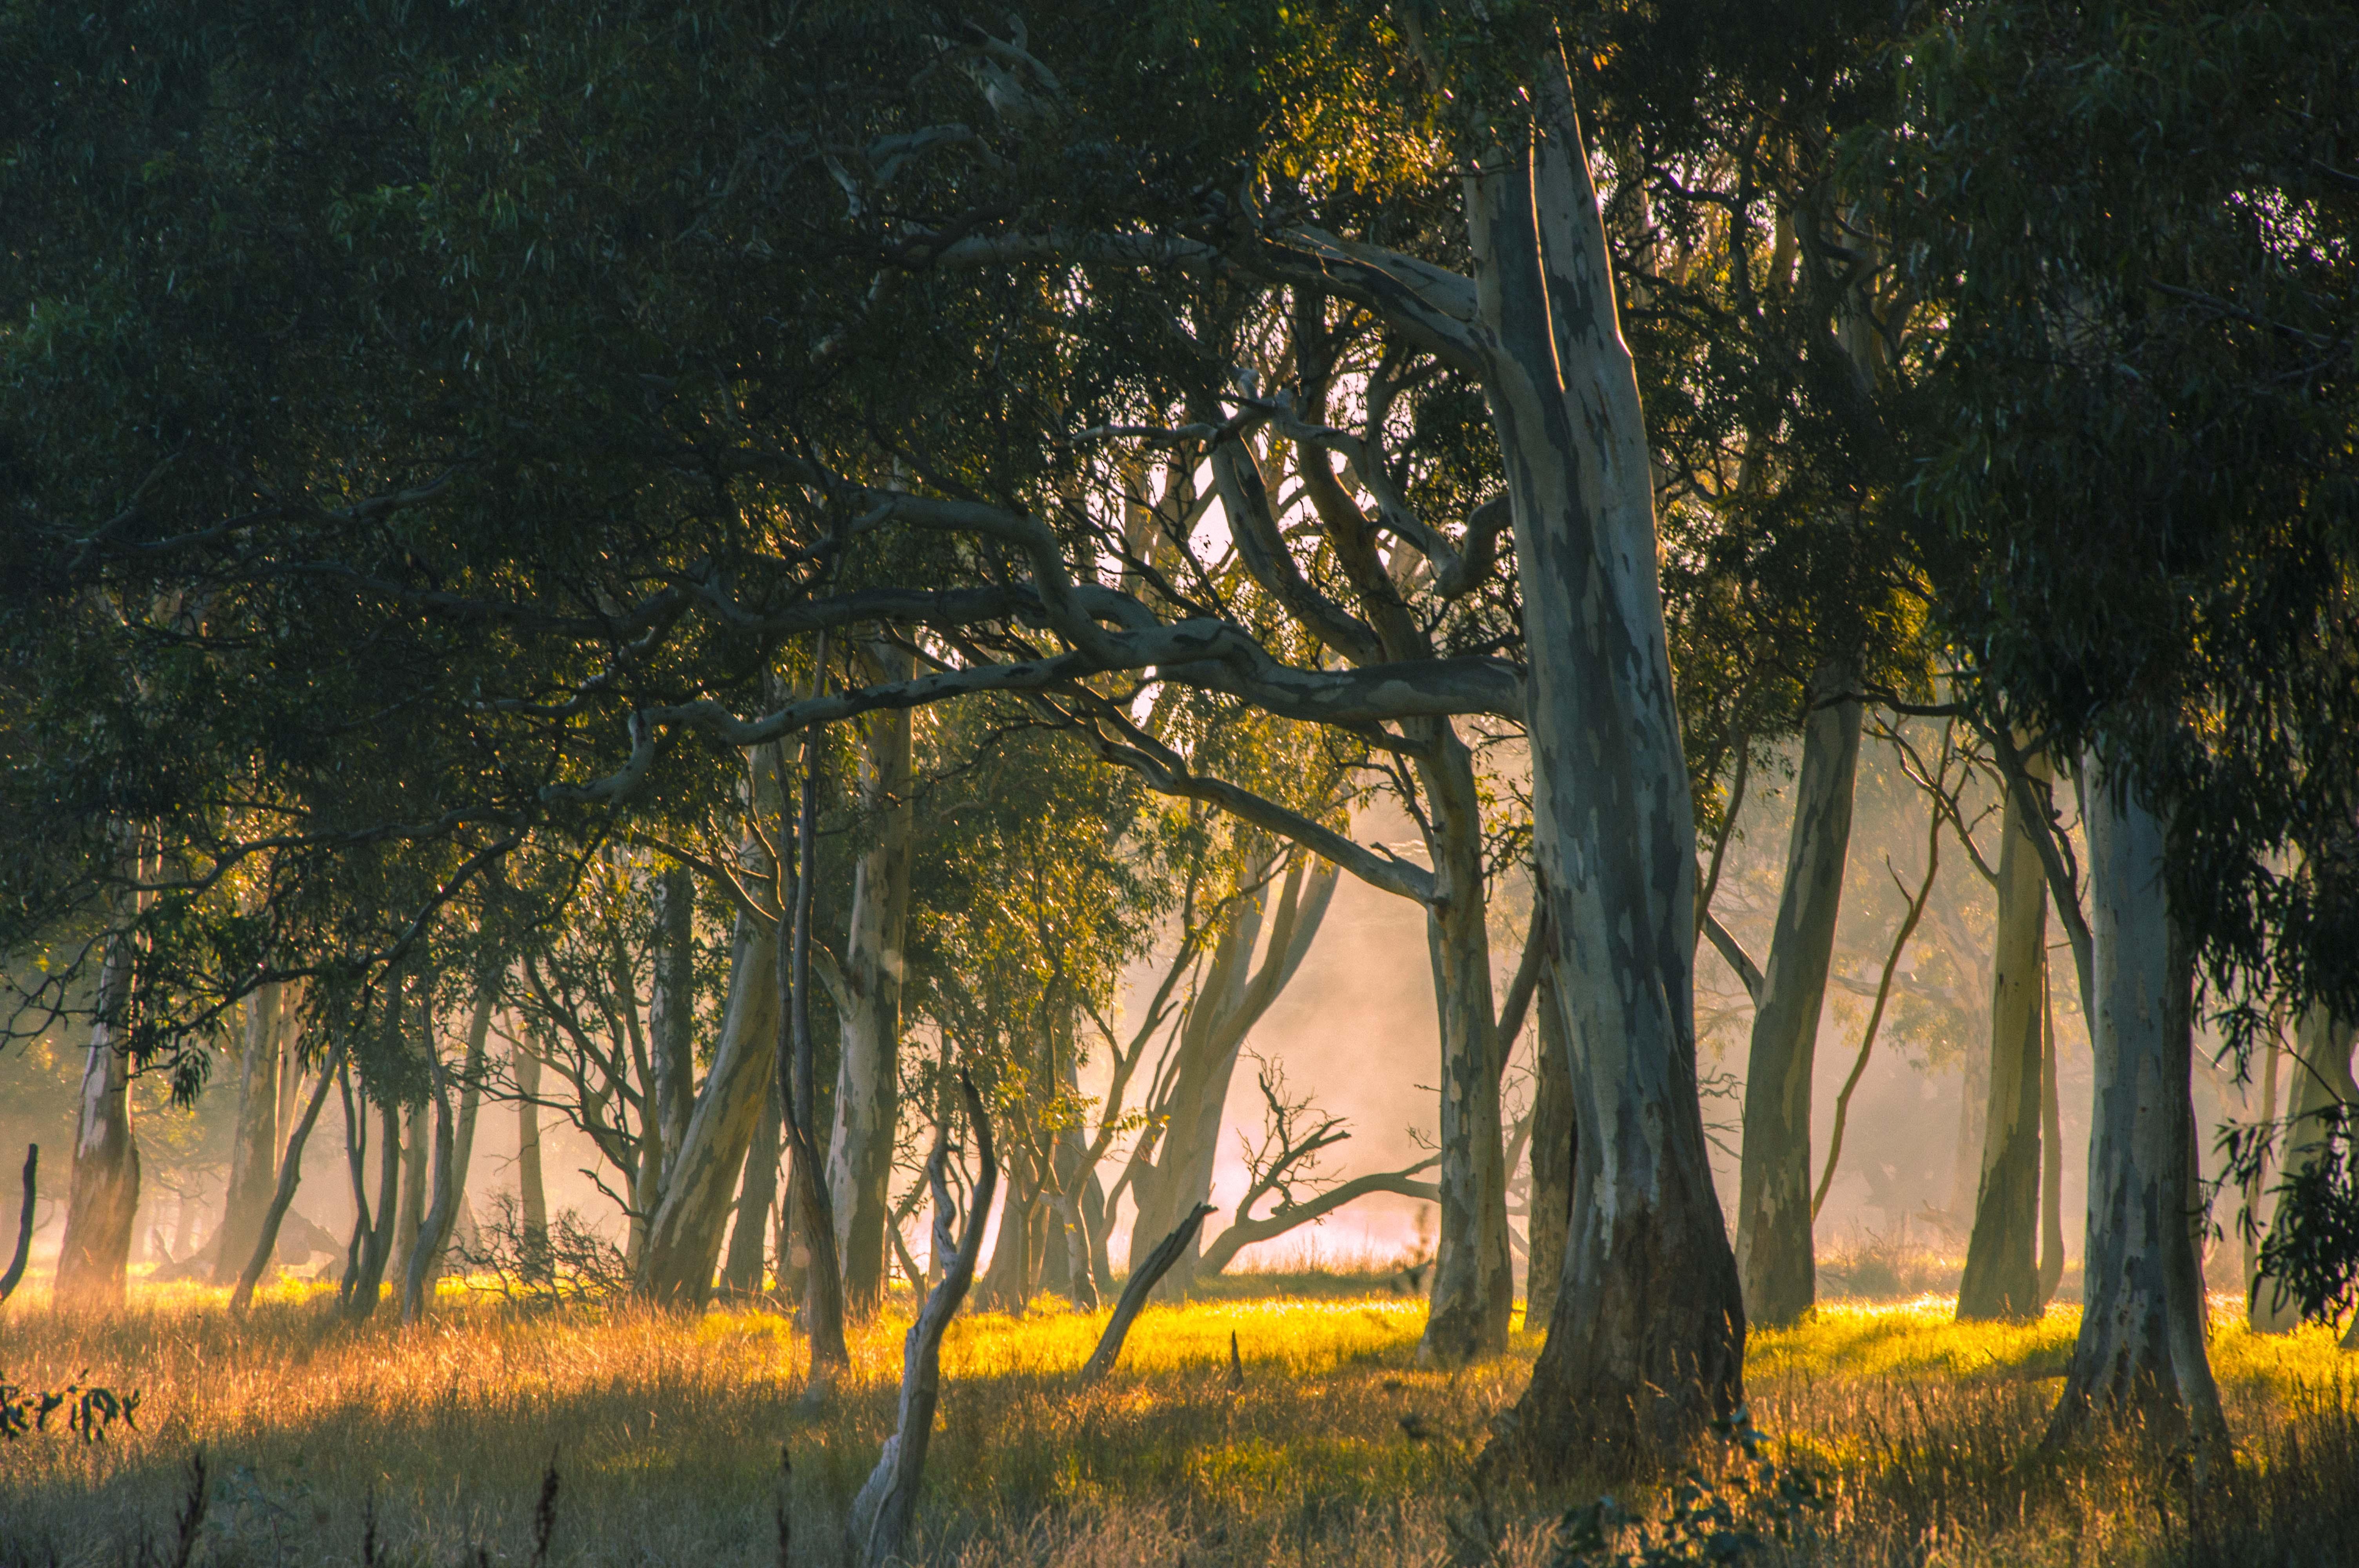 Morning walk trees